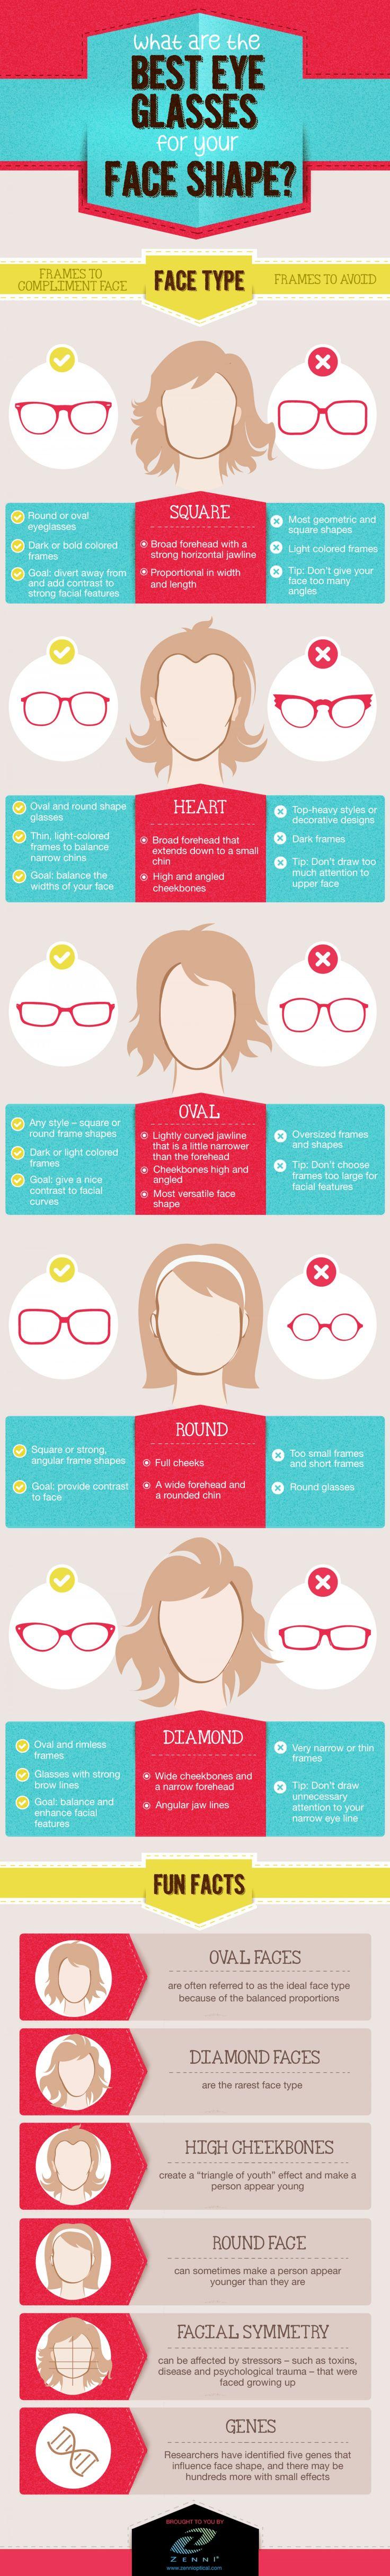 eyeglasses for your face shape